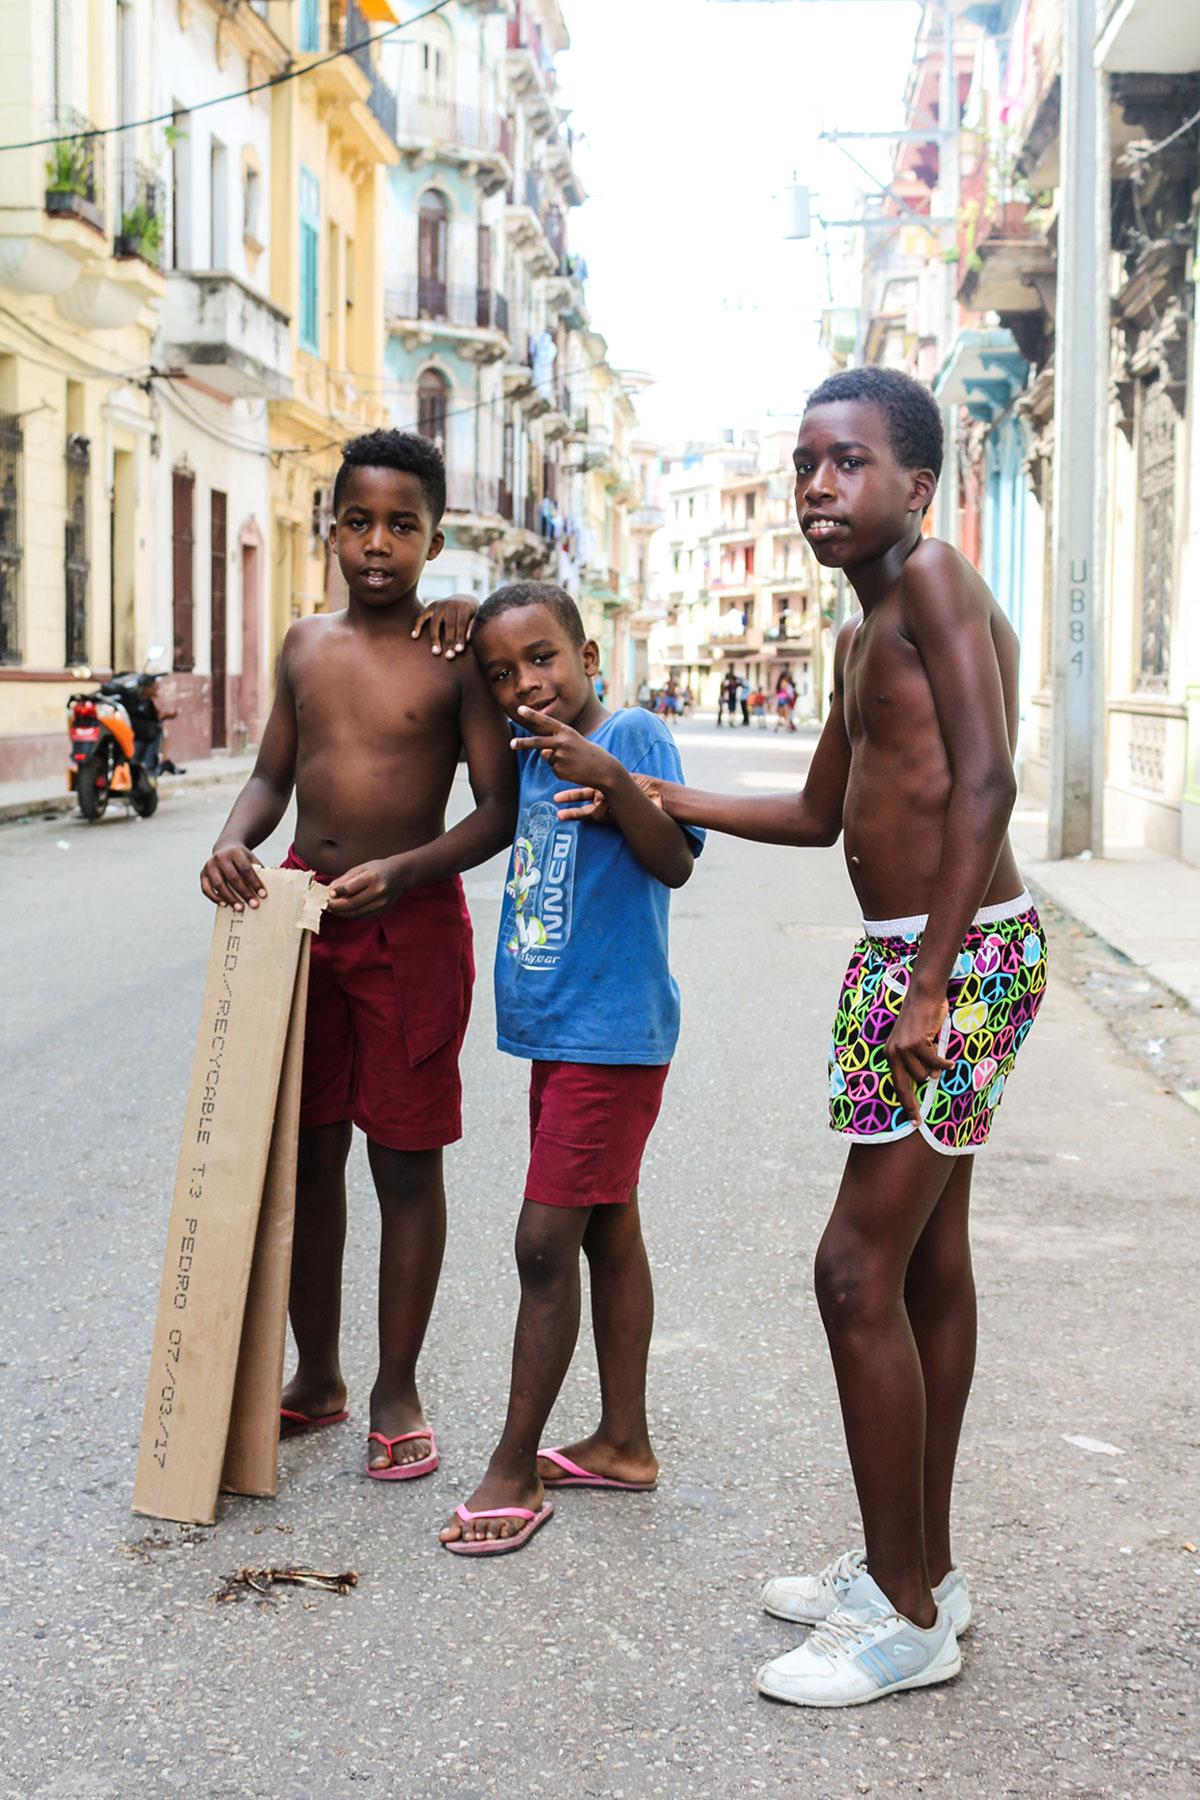 Boys posing for photo